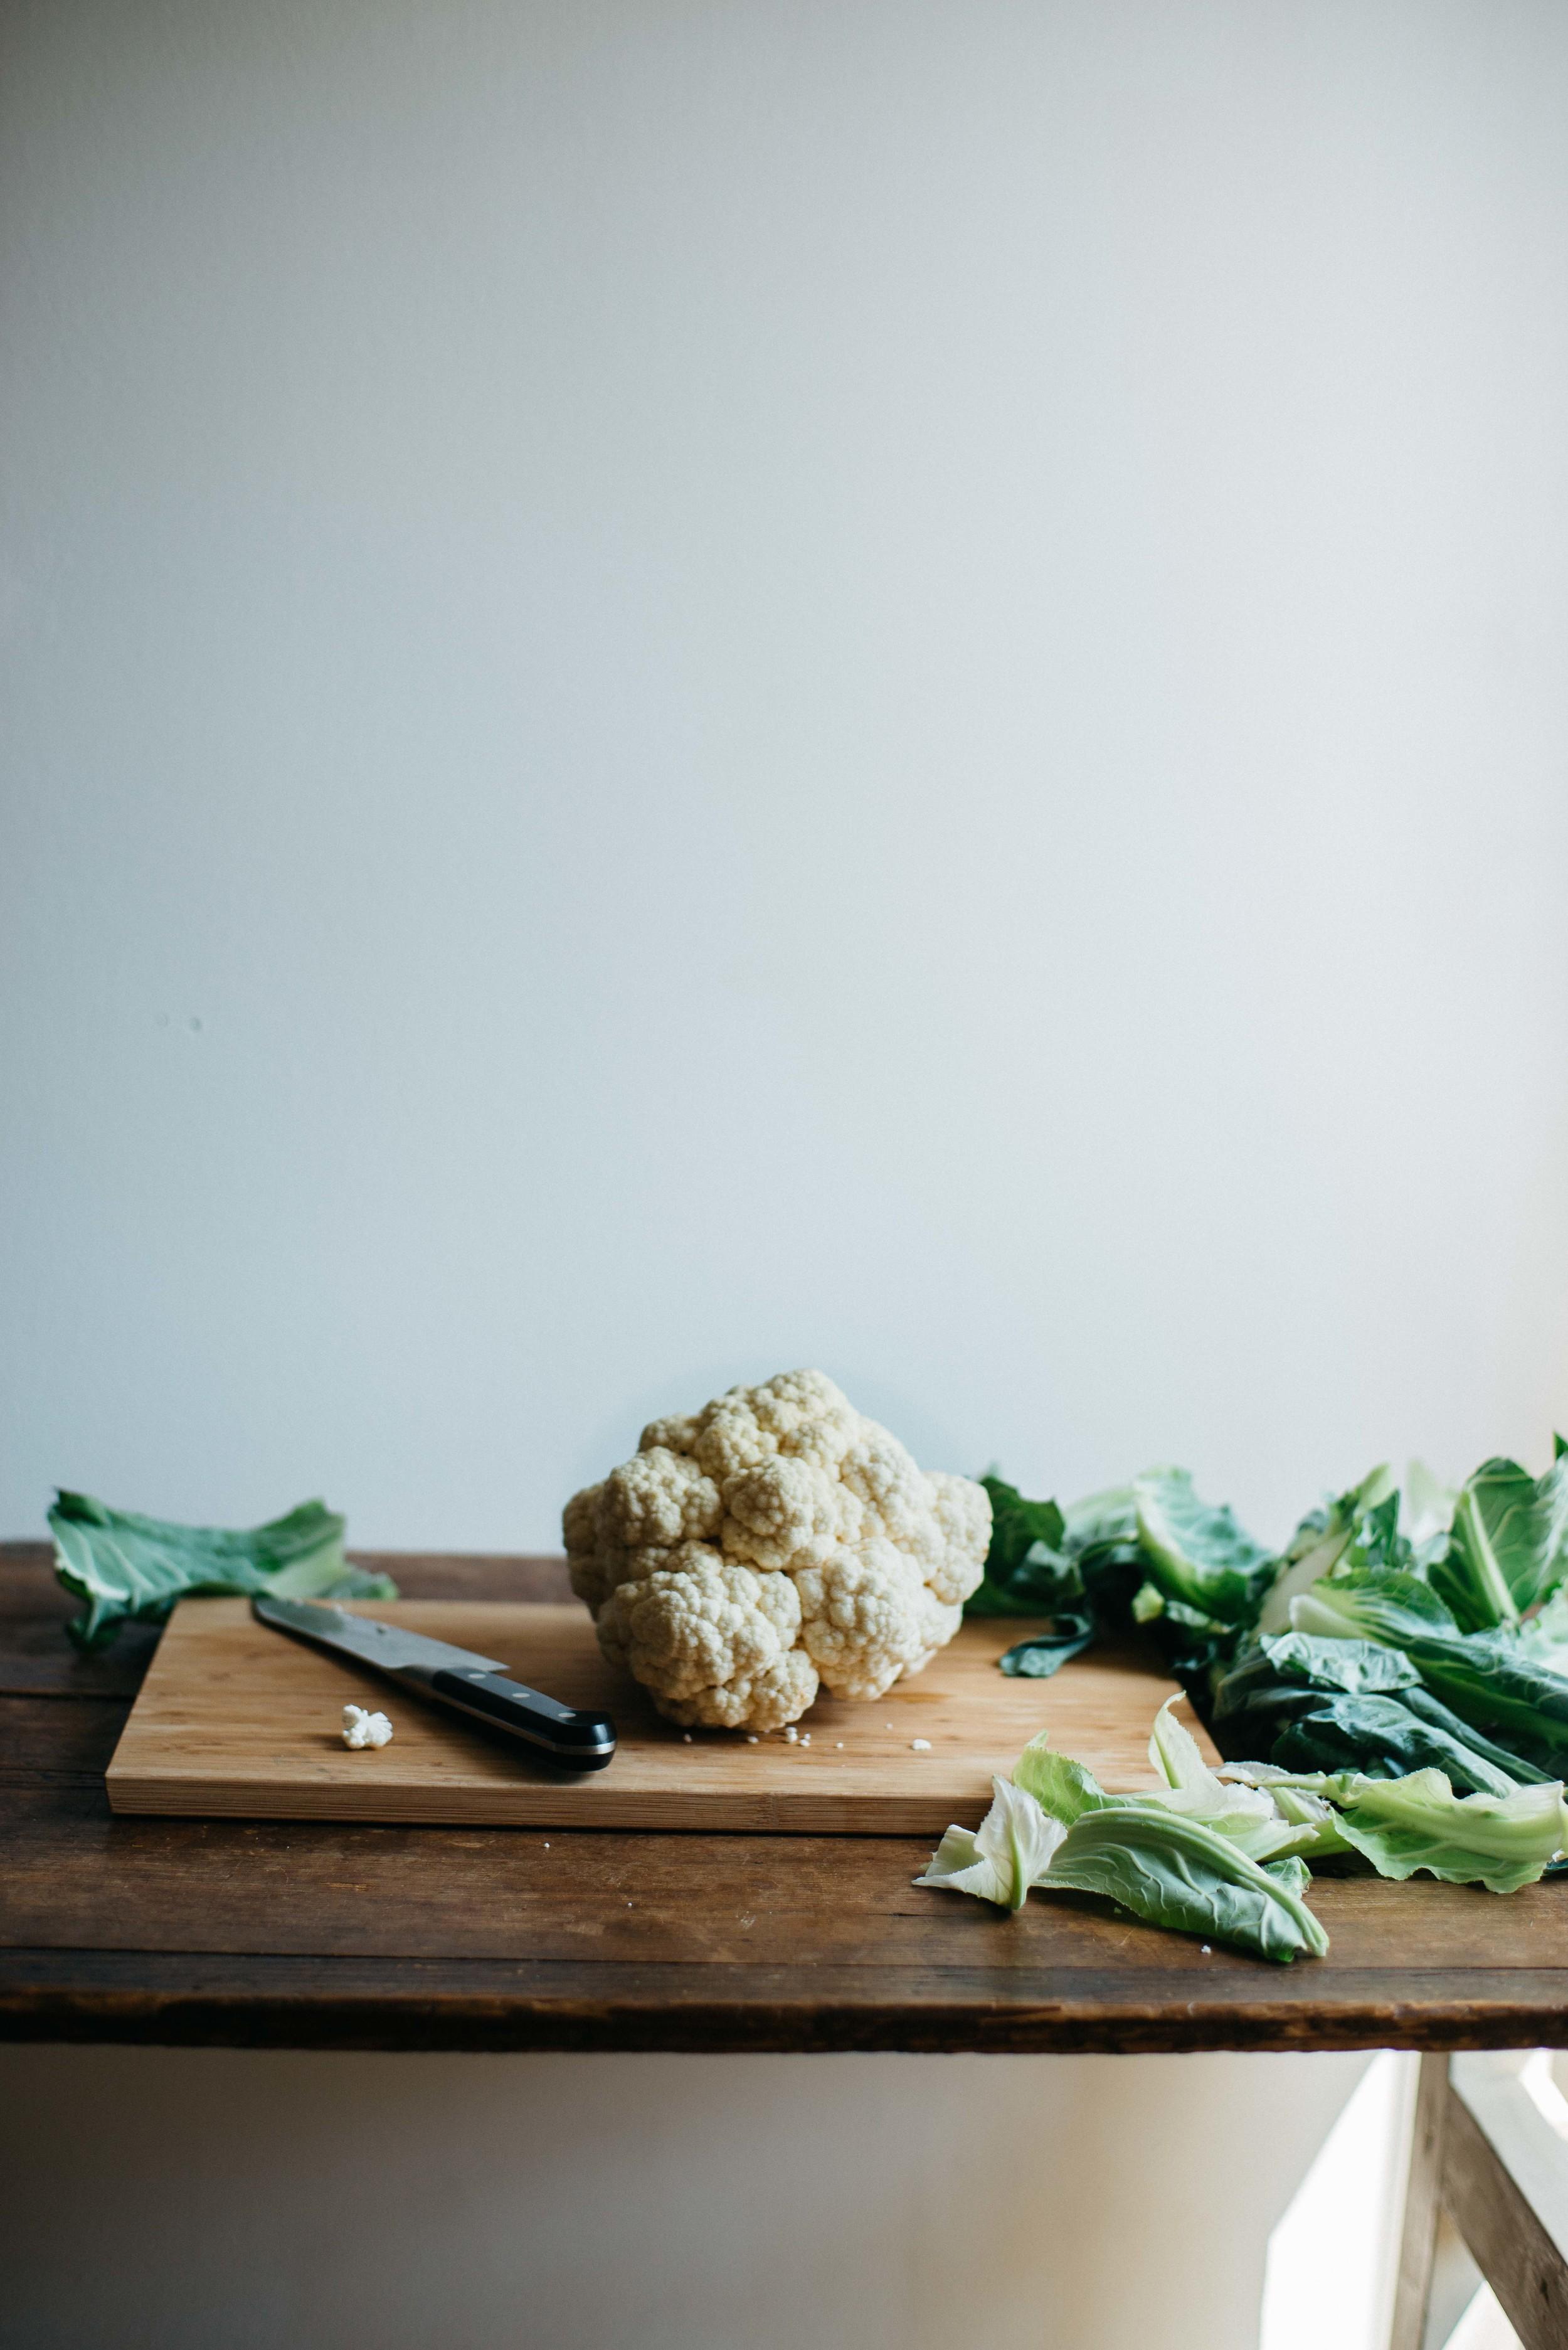 heidi's cauliflower pasta | dolly and oatmeal